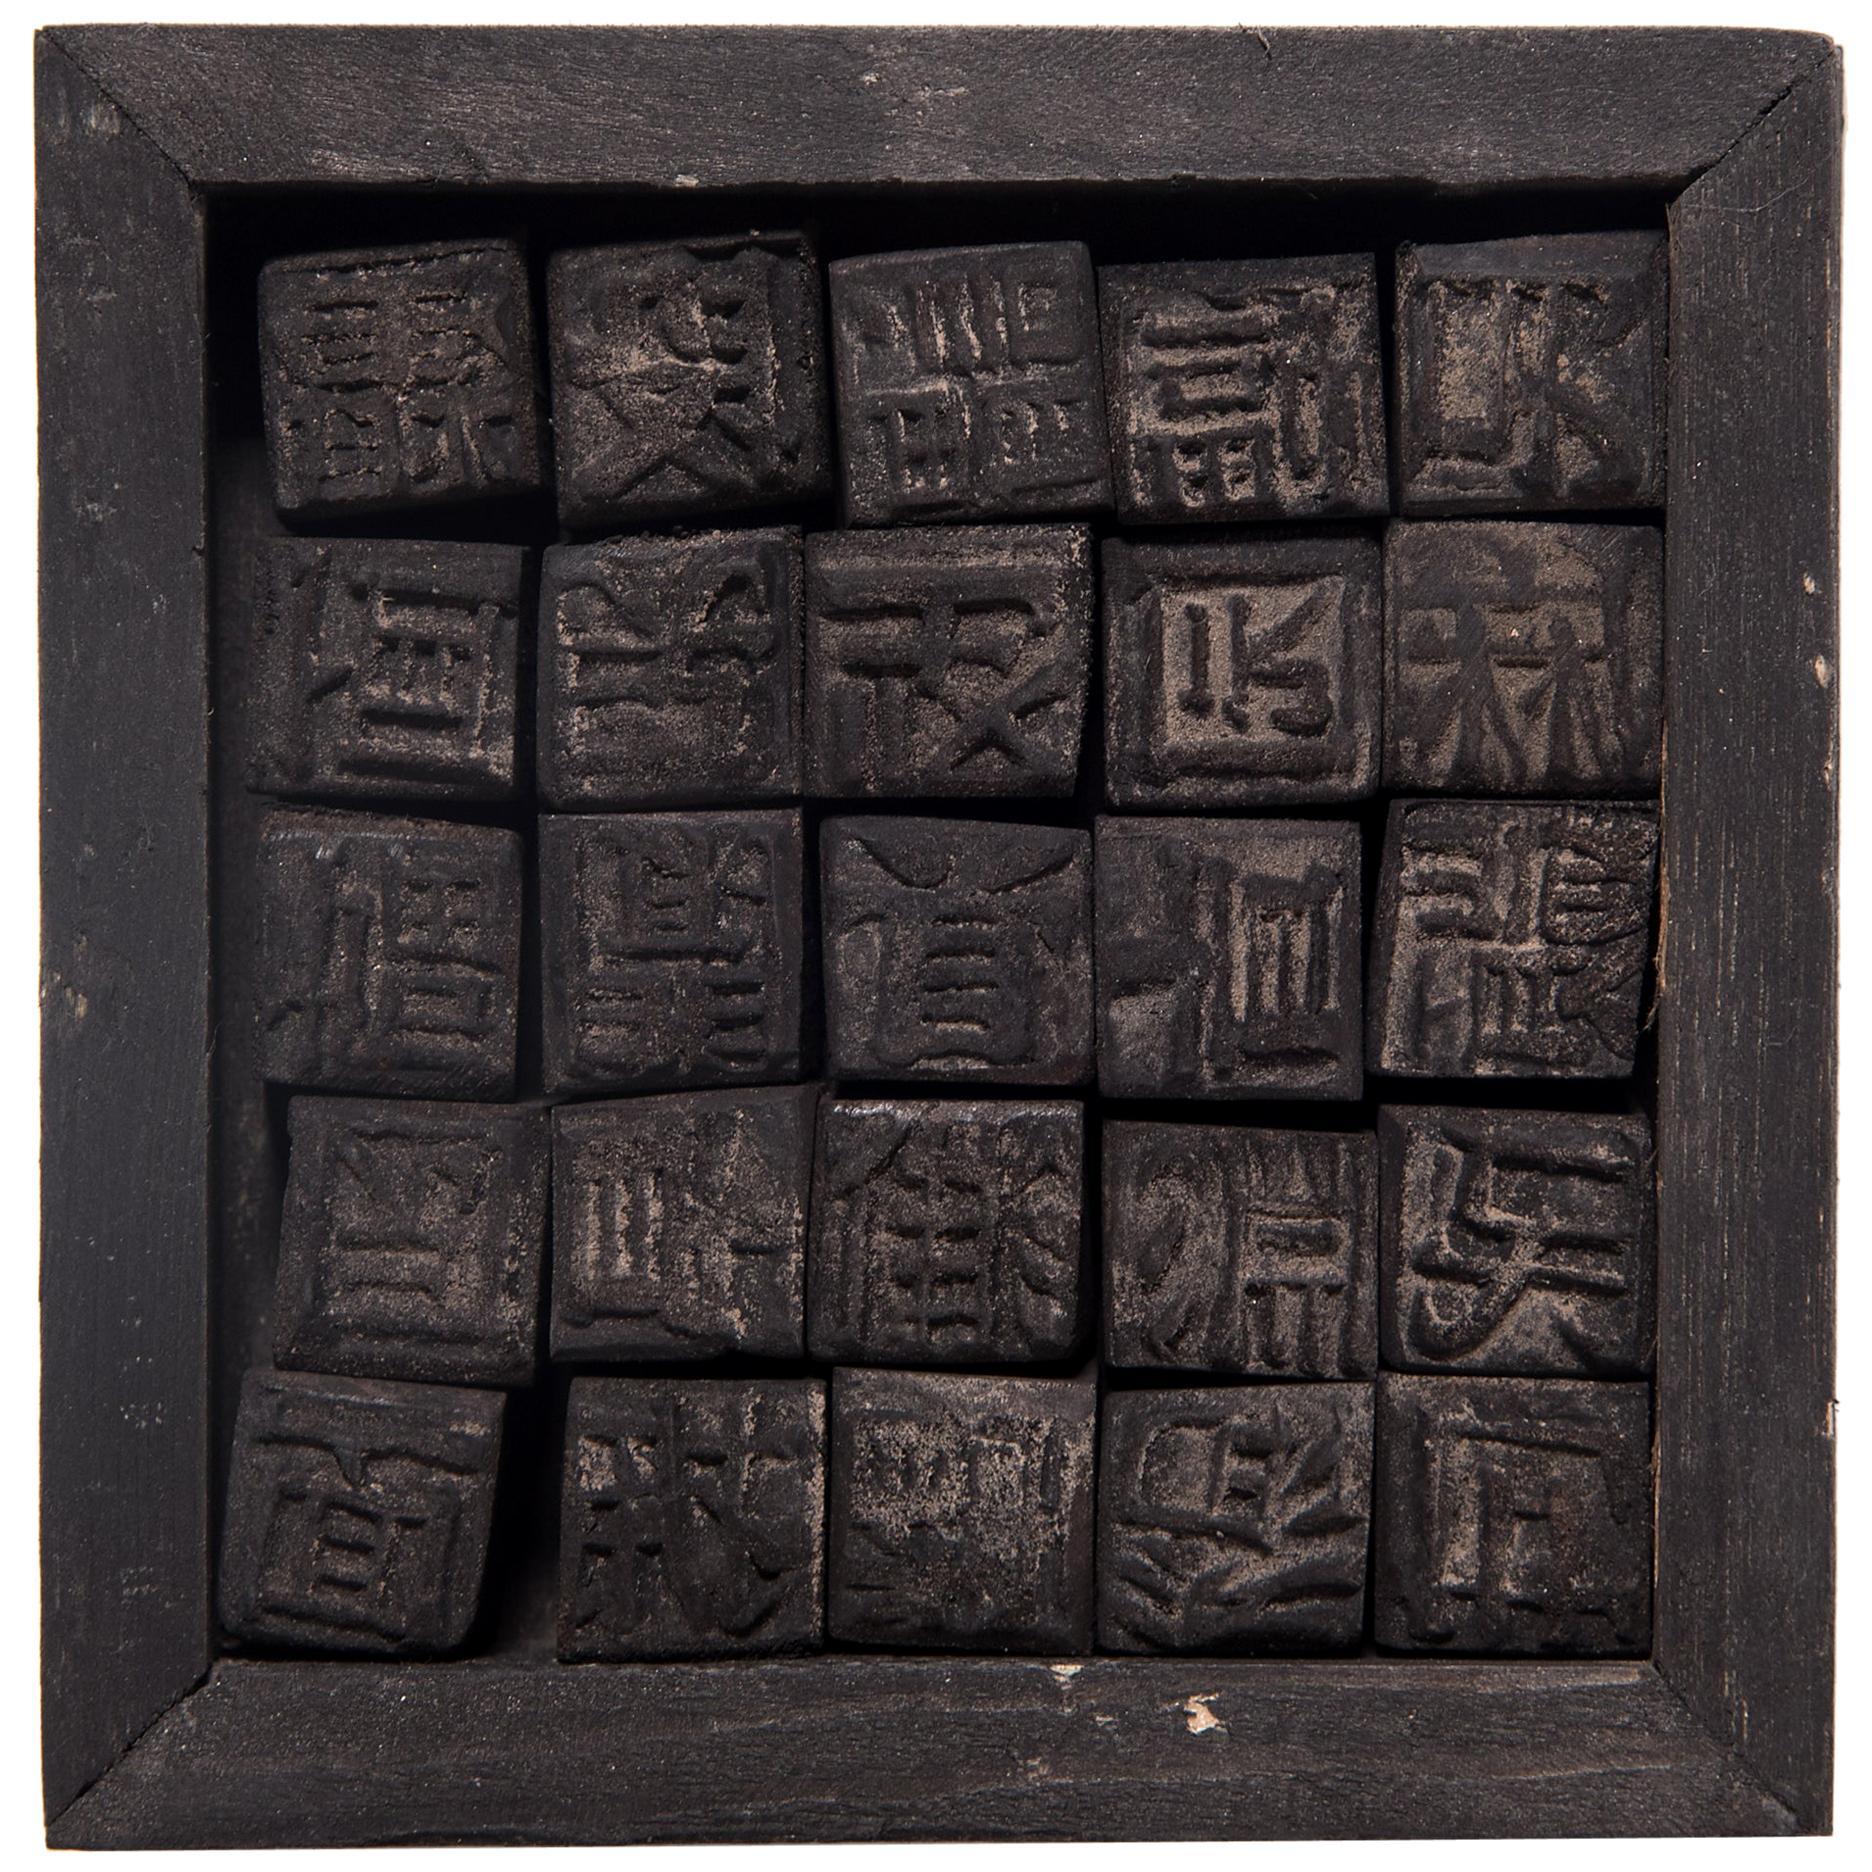 Chinese Wooden Block Printing Set, circa 1900